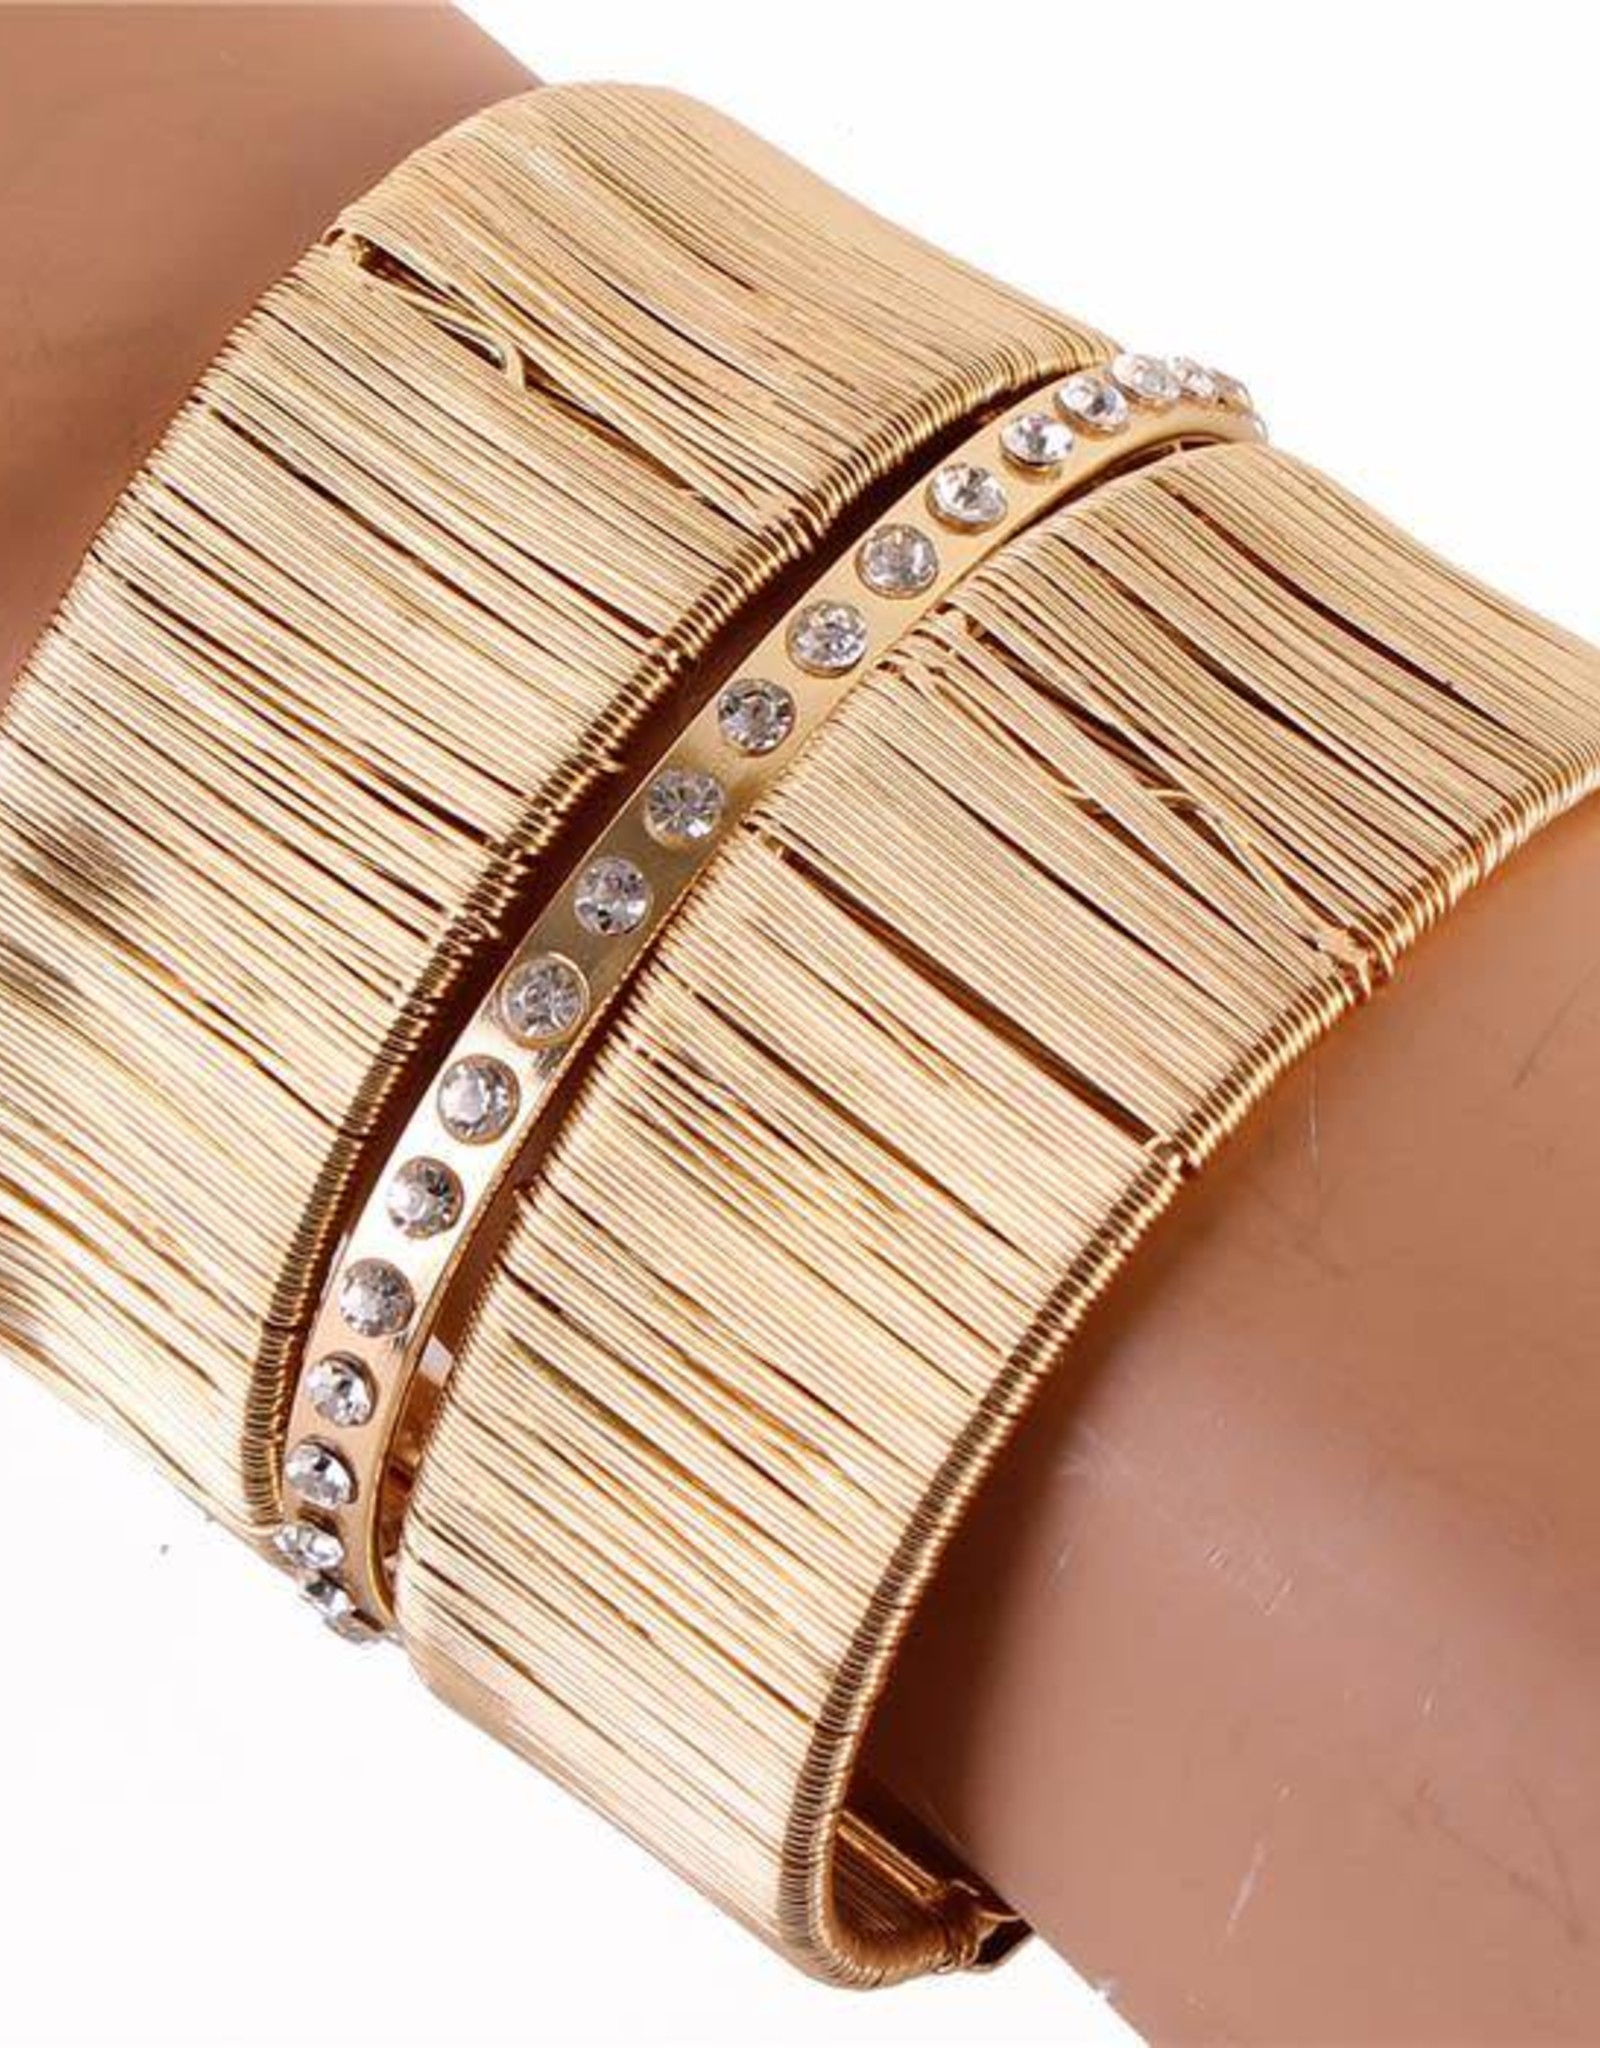 Between The Lines Cuff Bracelet